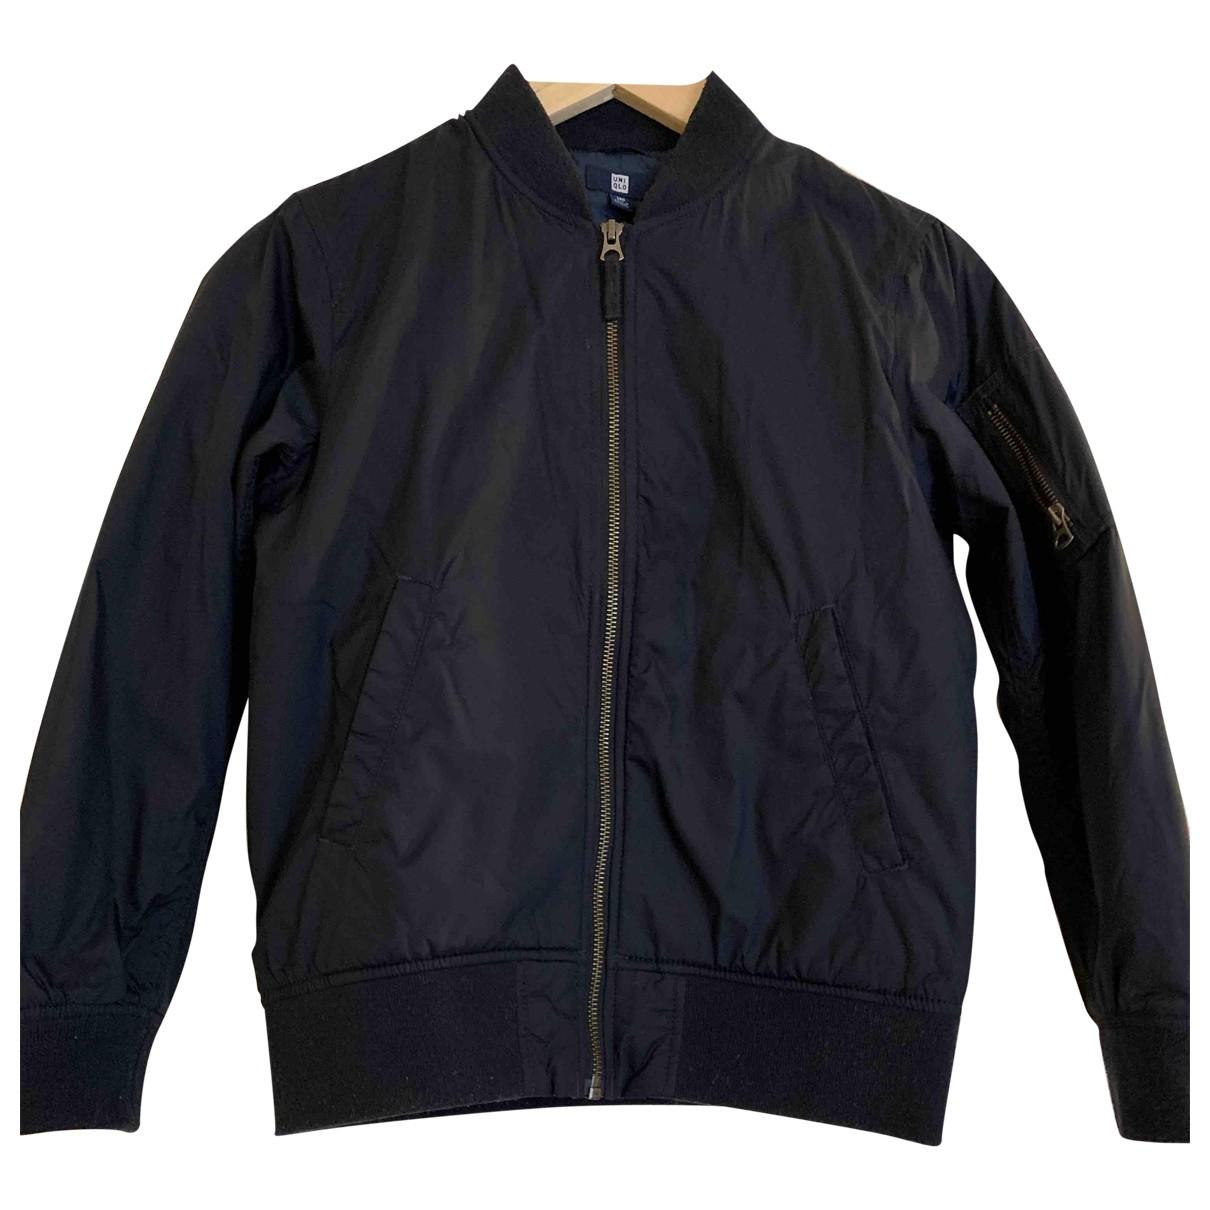 Uniqlo \N Blue jacket & coat for Kids 12 years - XS FR